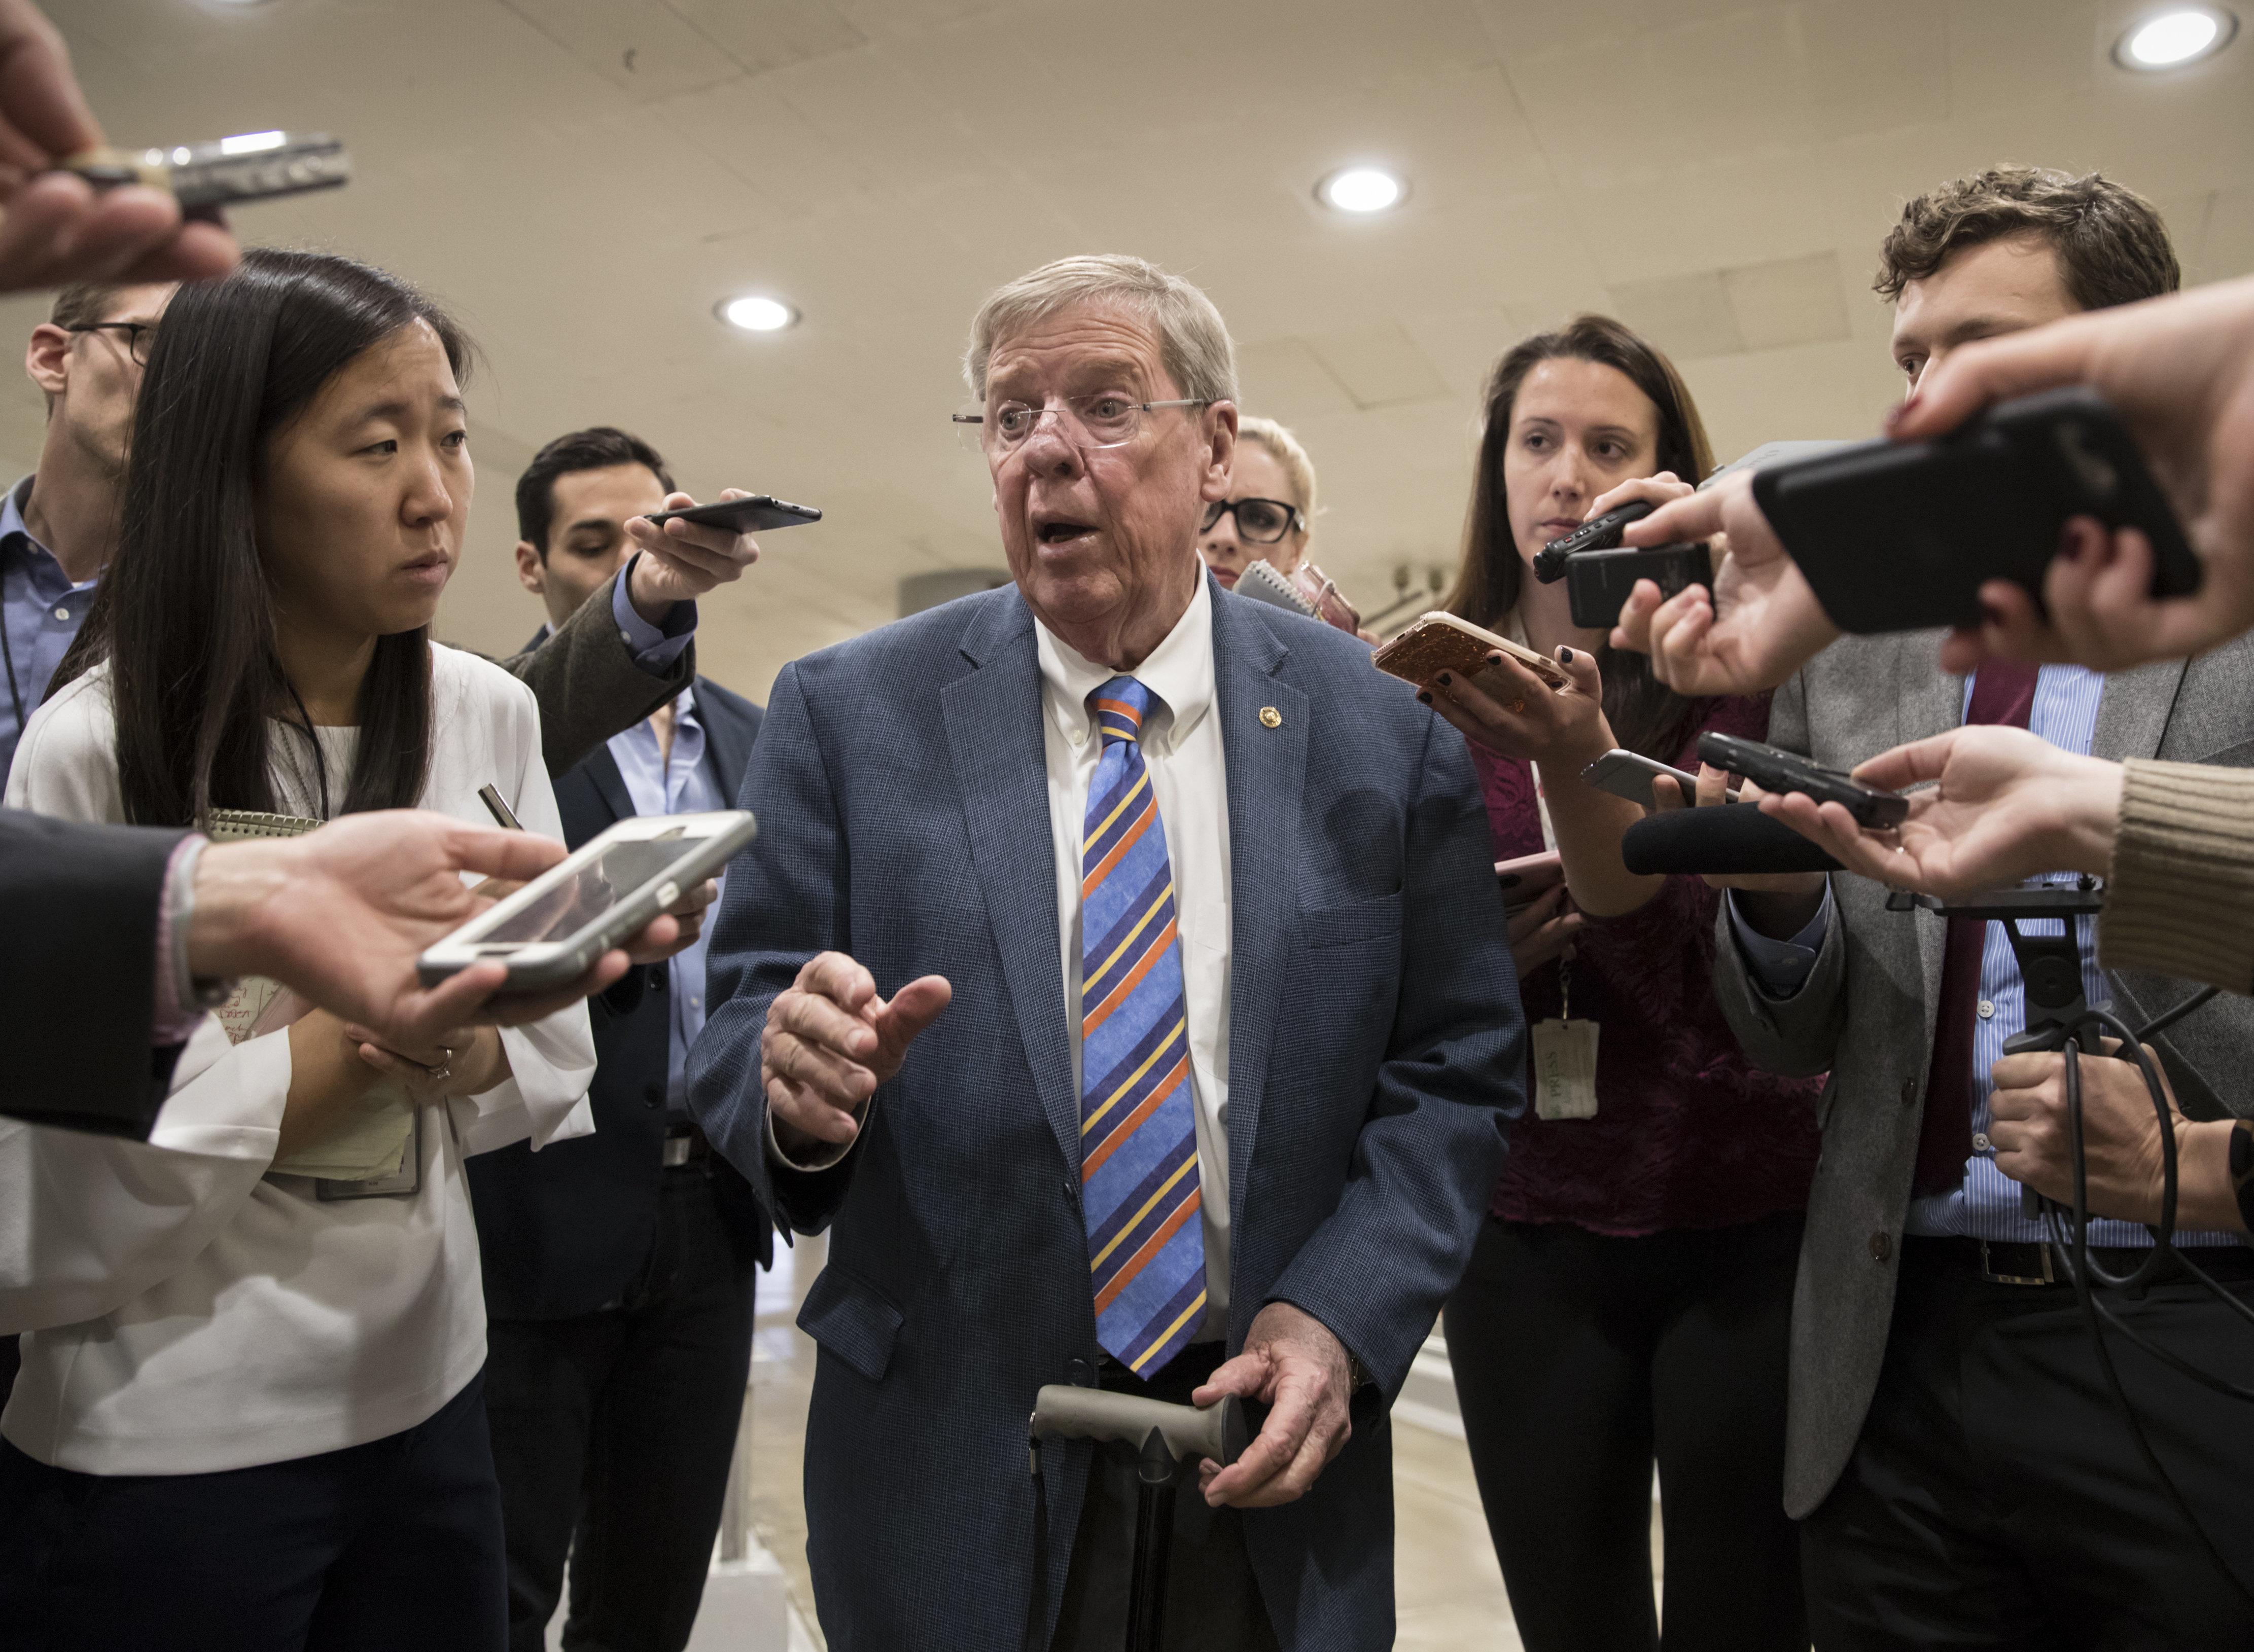 GOP Senator Johnny Isakson Slams Trump's 'Deplorable' Attacks On